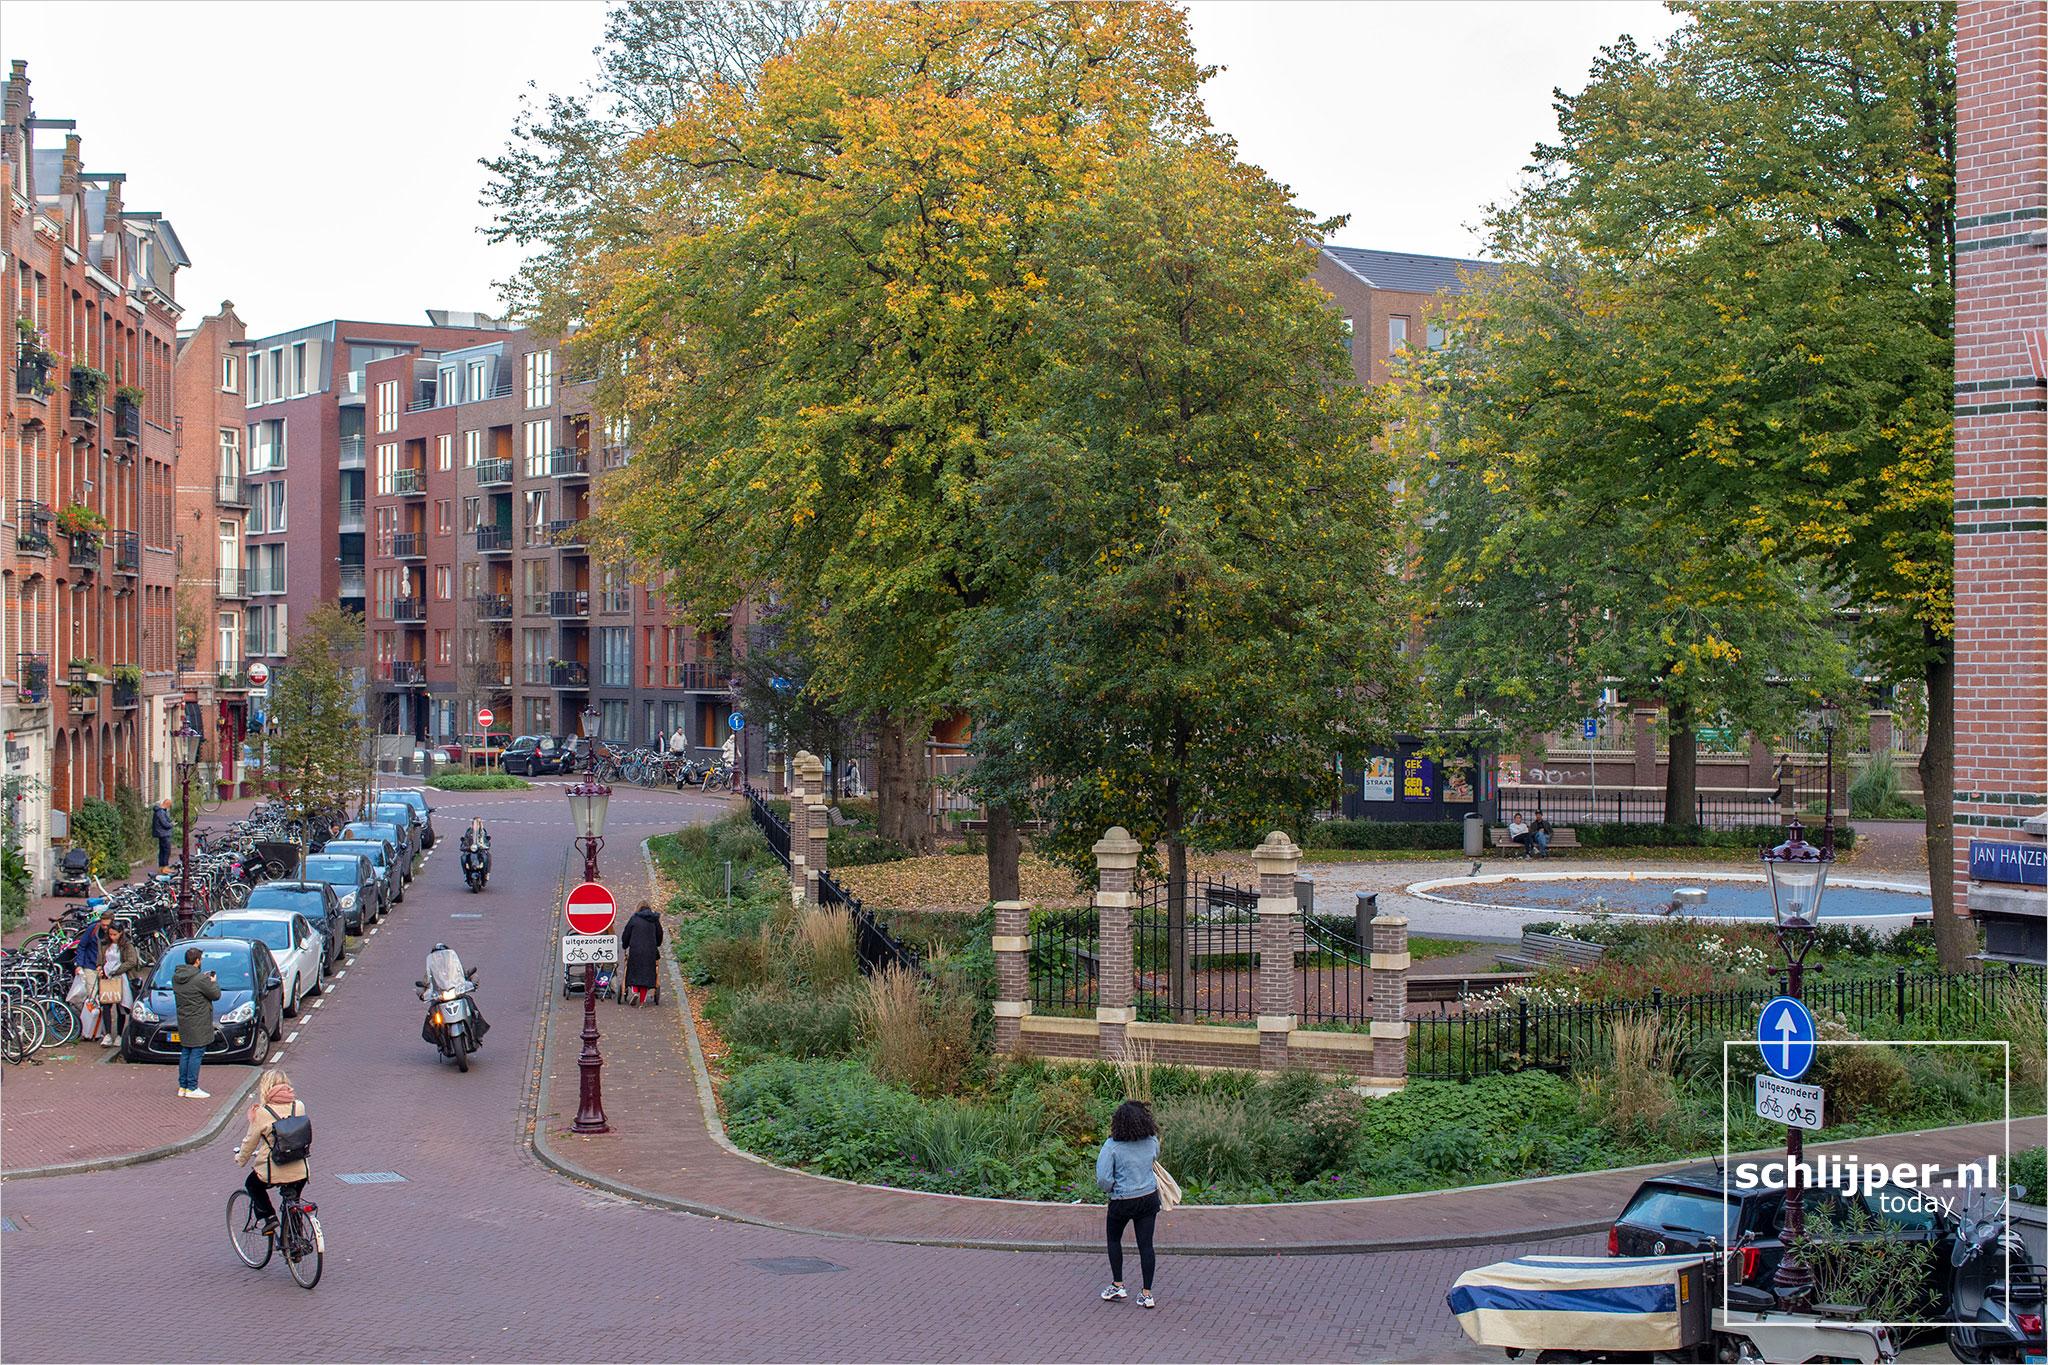 Nederland, Amsterdam, 17 oktober 2020